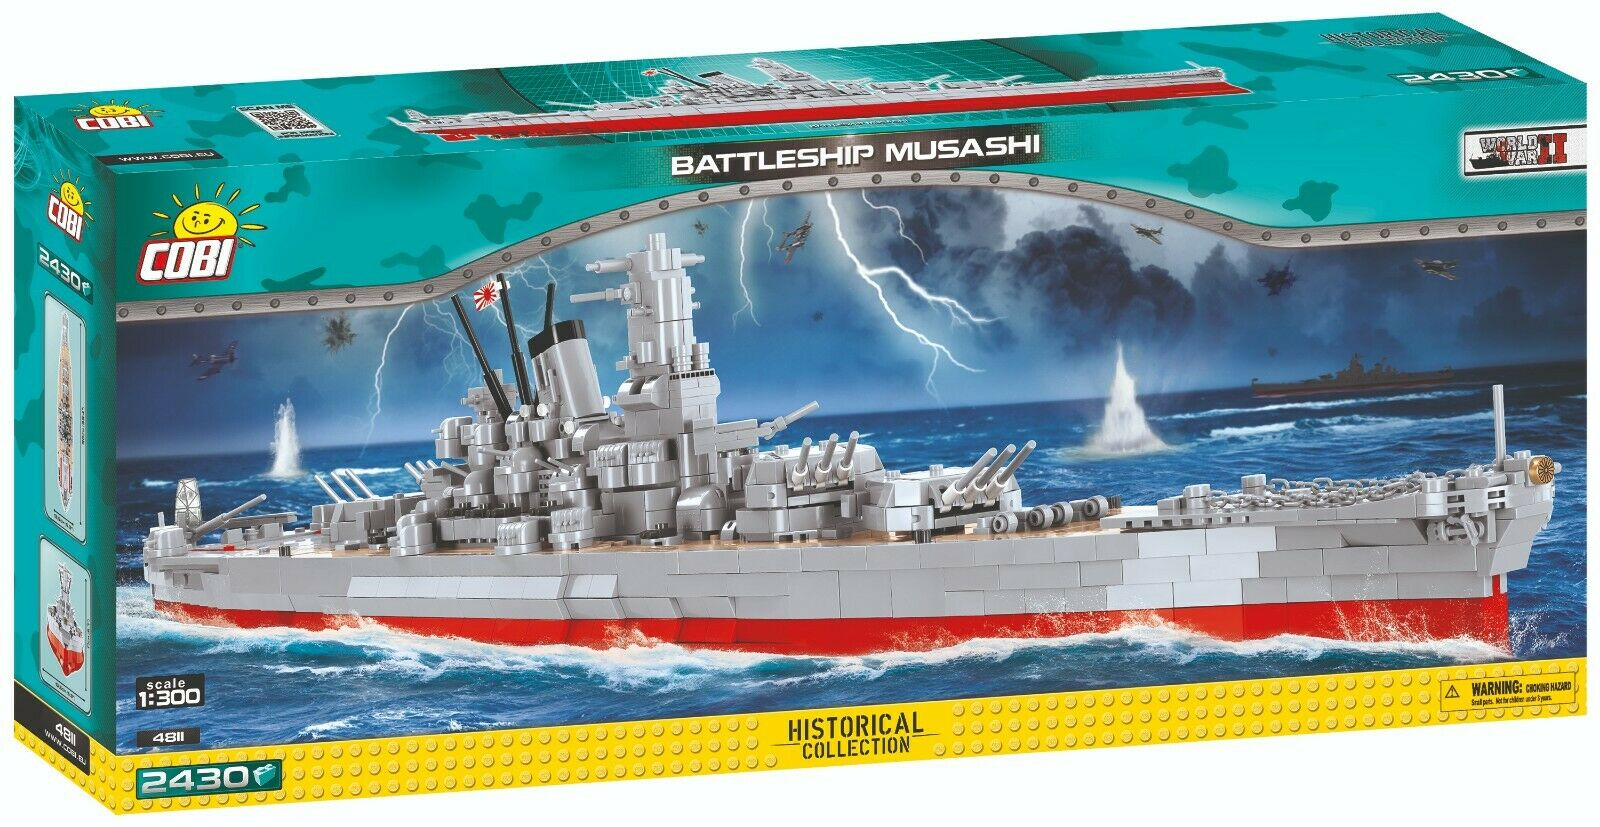 COBI battleship  Musashi    4811   2430 blocks WWII Japanese ship Small Army